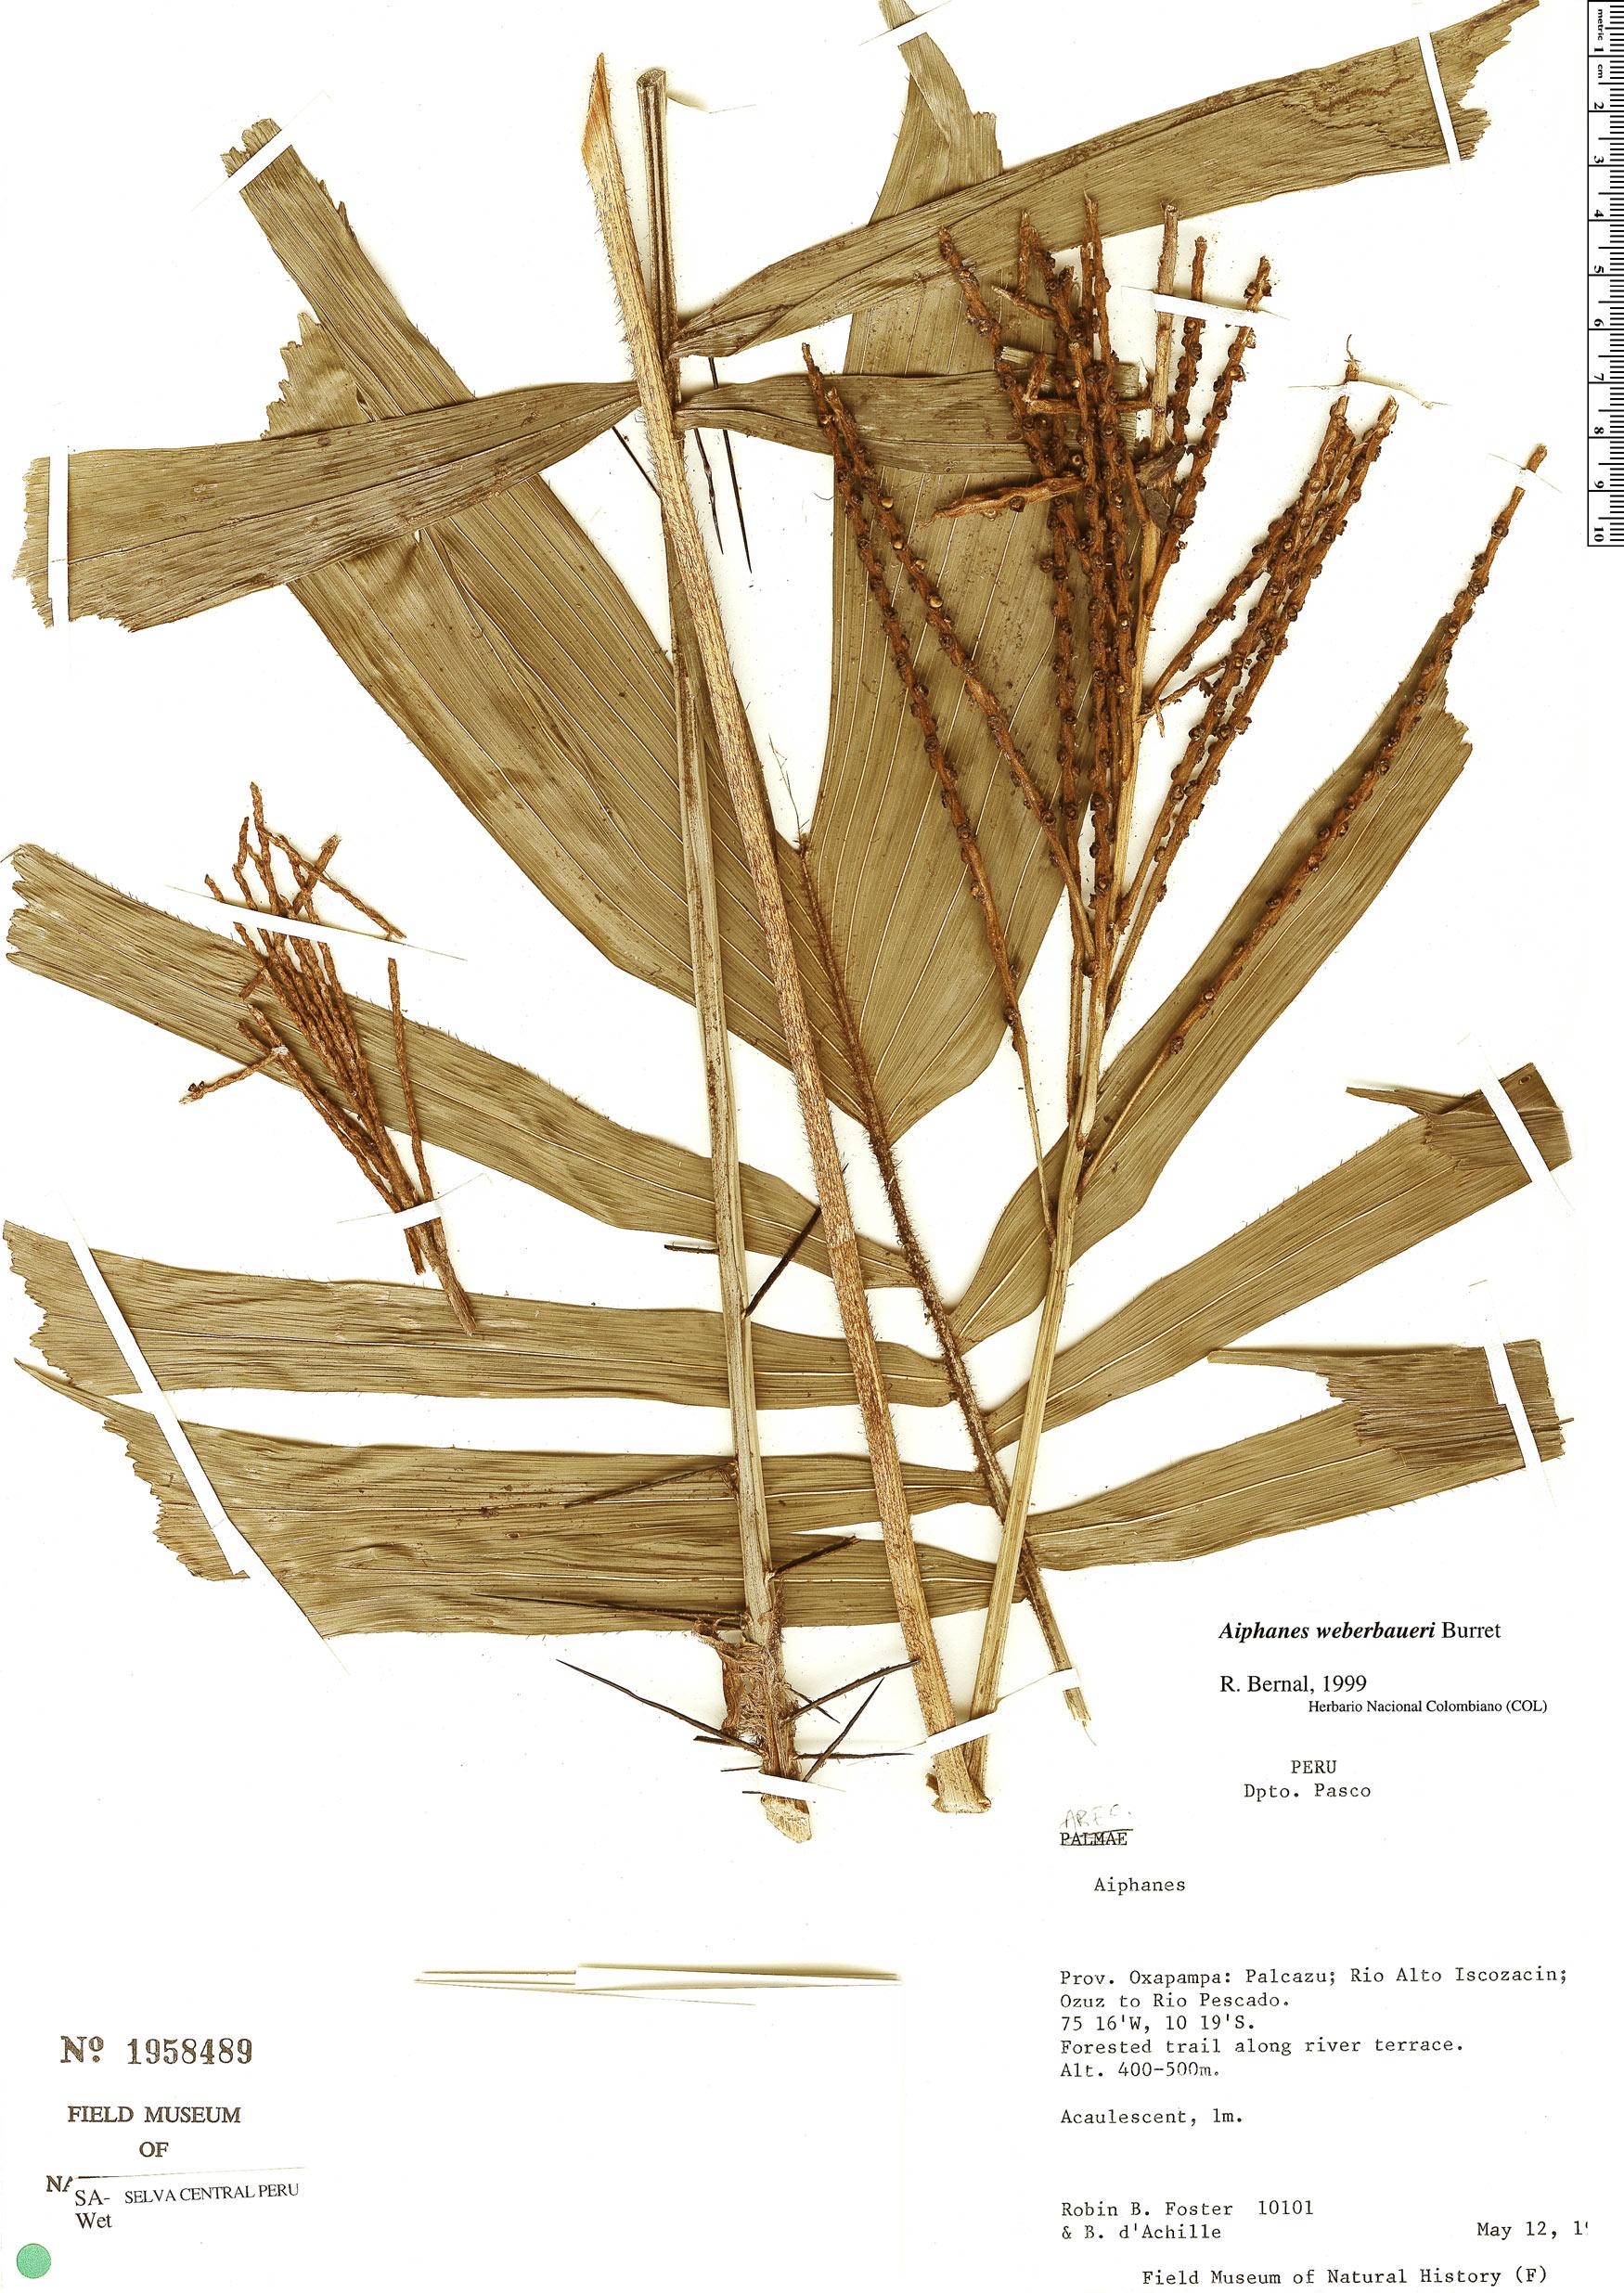 Espécime: Aiphanes weberbaueri